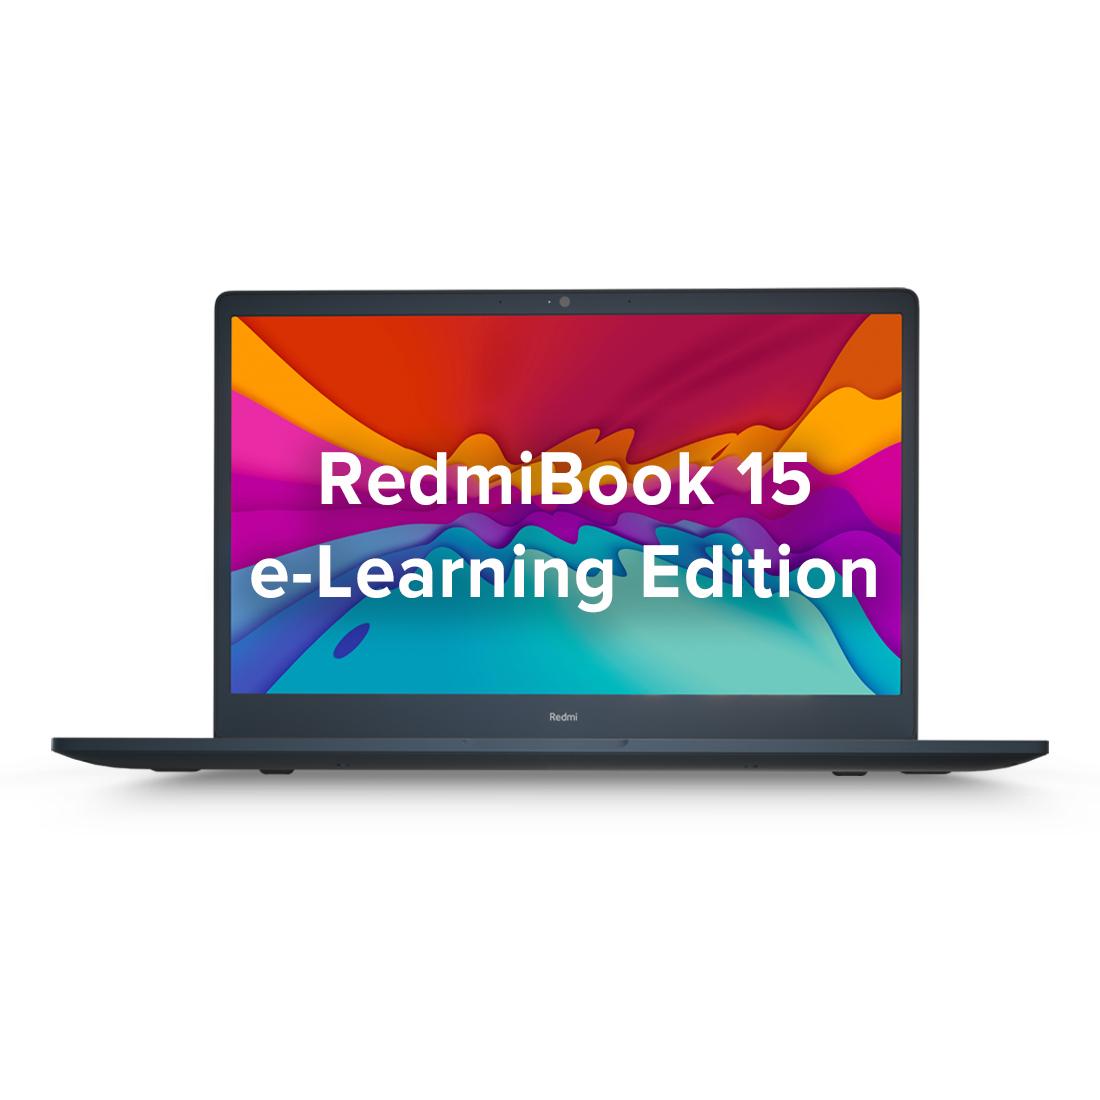 RedmiBook e-Learning Edition